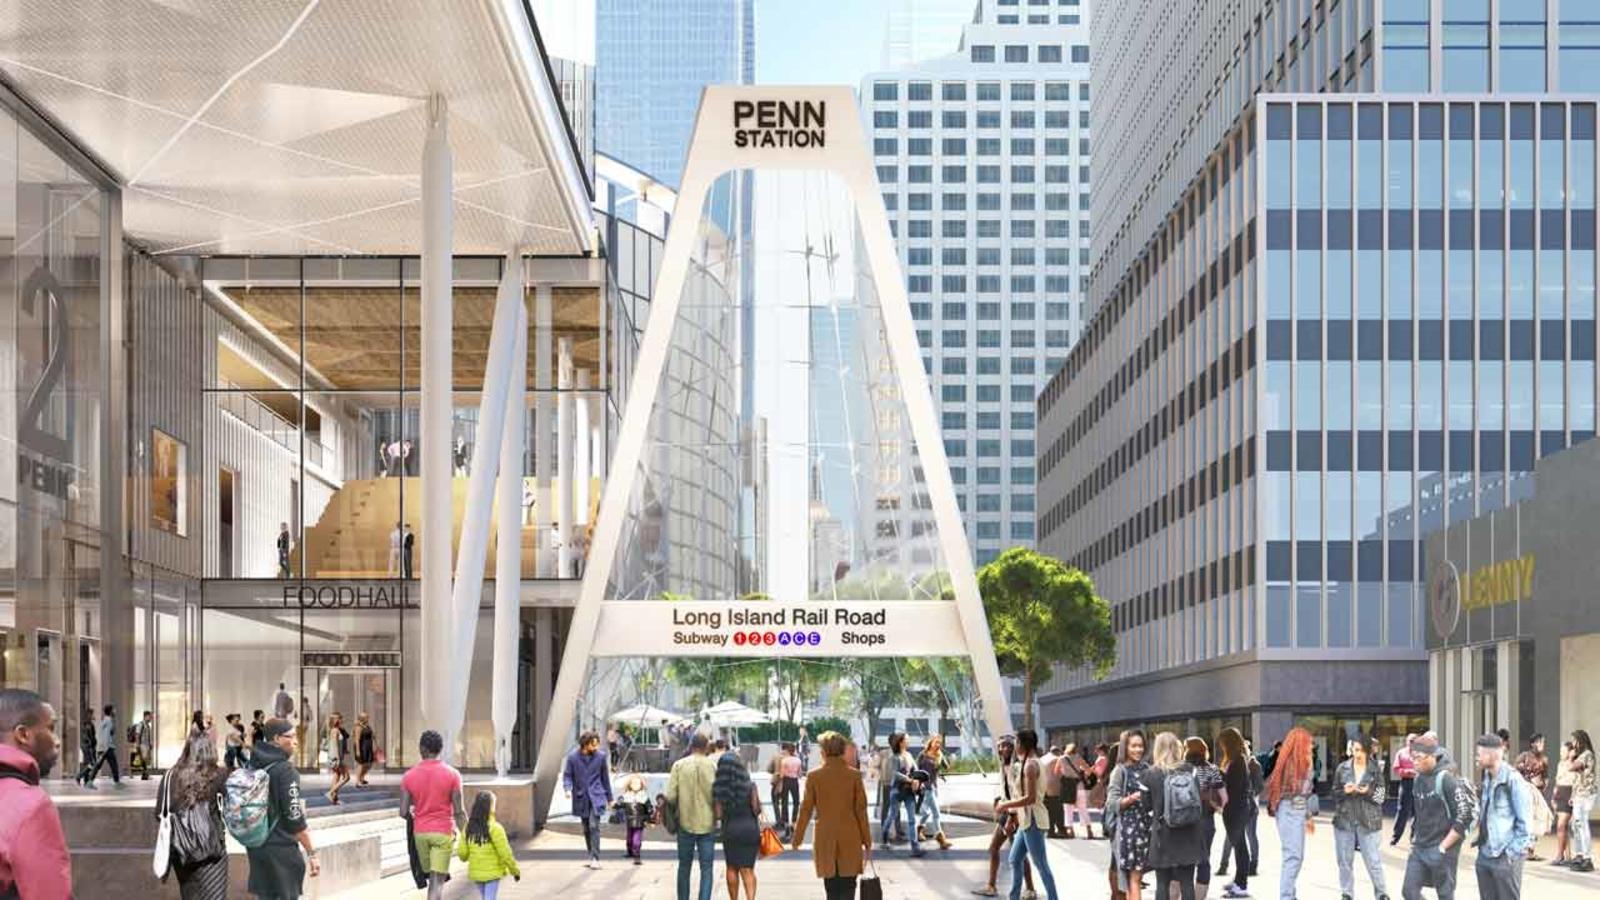 Penn Station makeover: New York Gov. Andrew Cuomo unveils new main entrance design